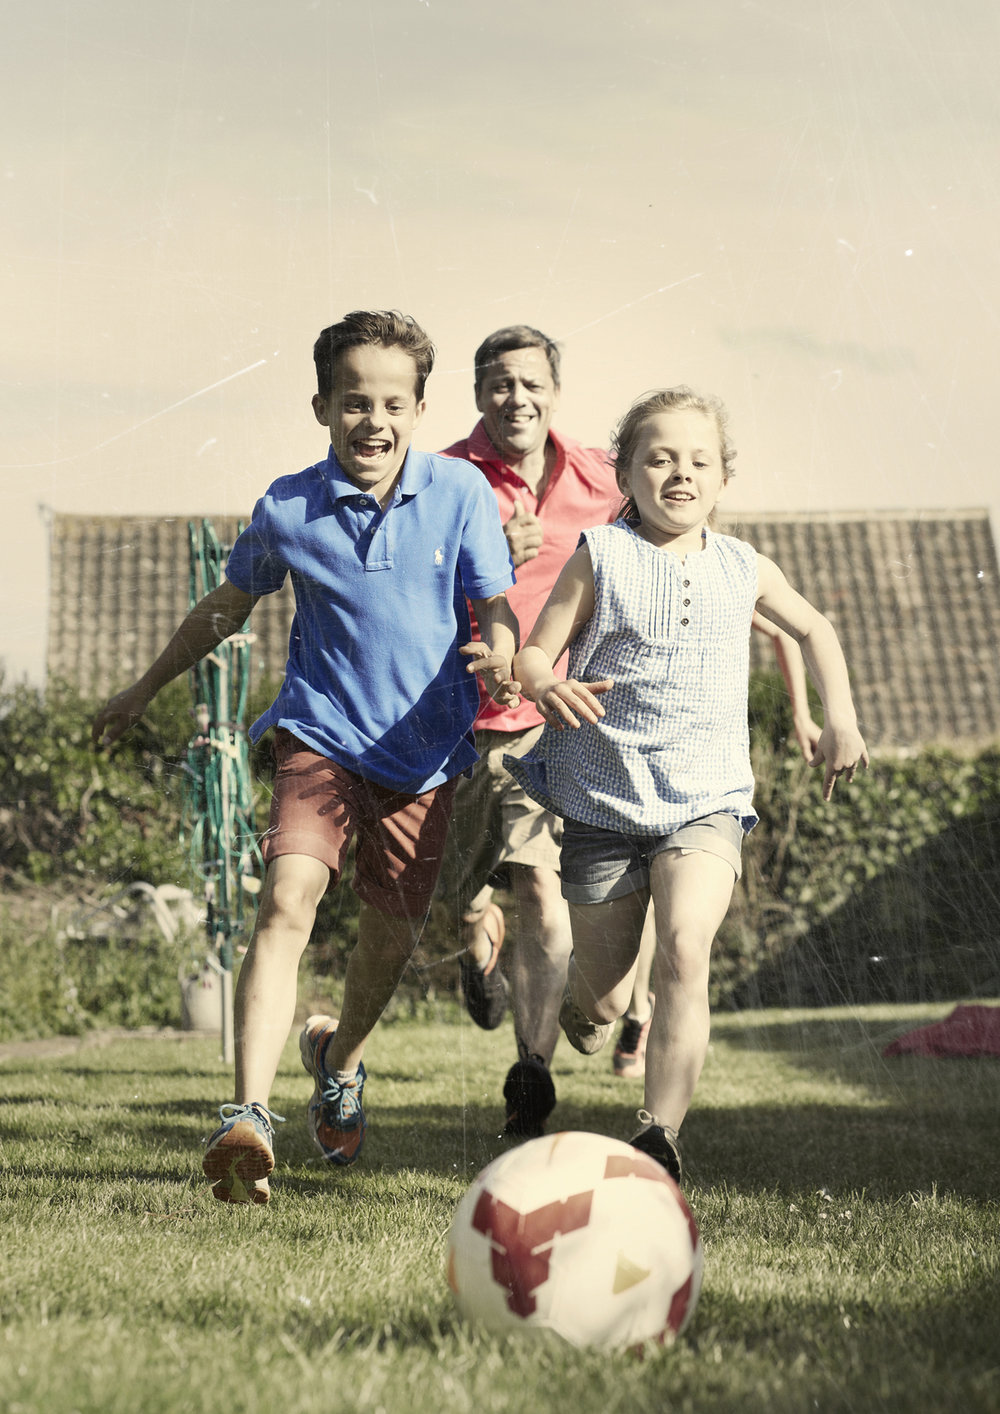 RanaldMackechnie.The FA. 'Love Football. Play Football3.jpg